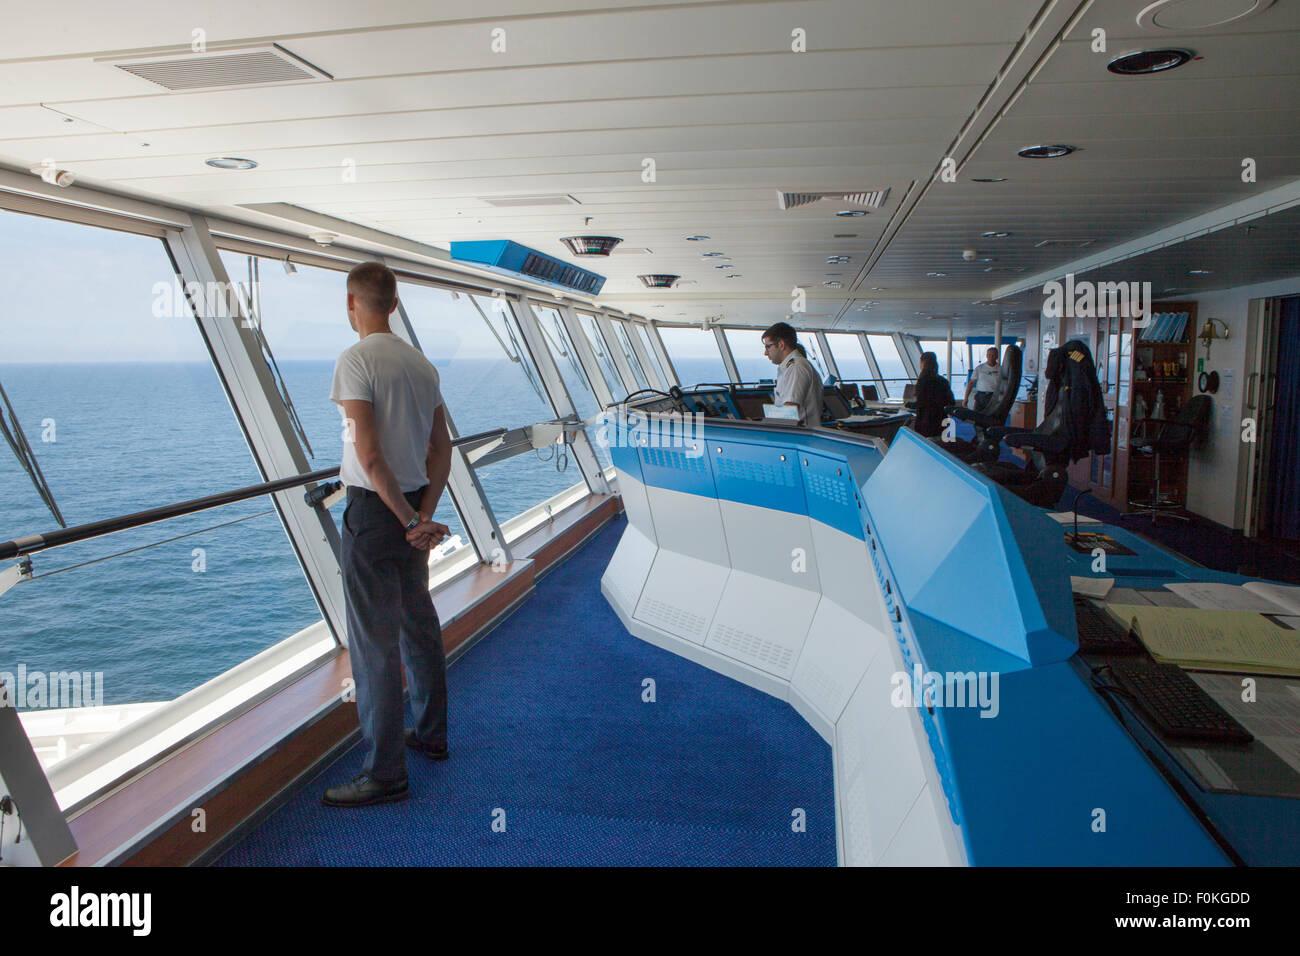 Carnival Vista | Deck Plans ... - Carnival Cruise Line